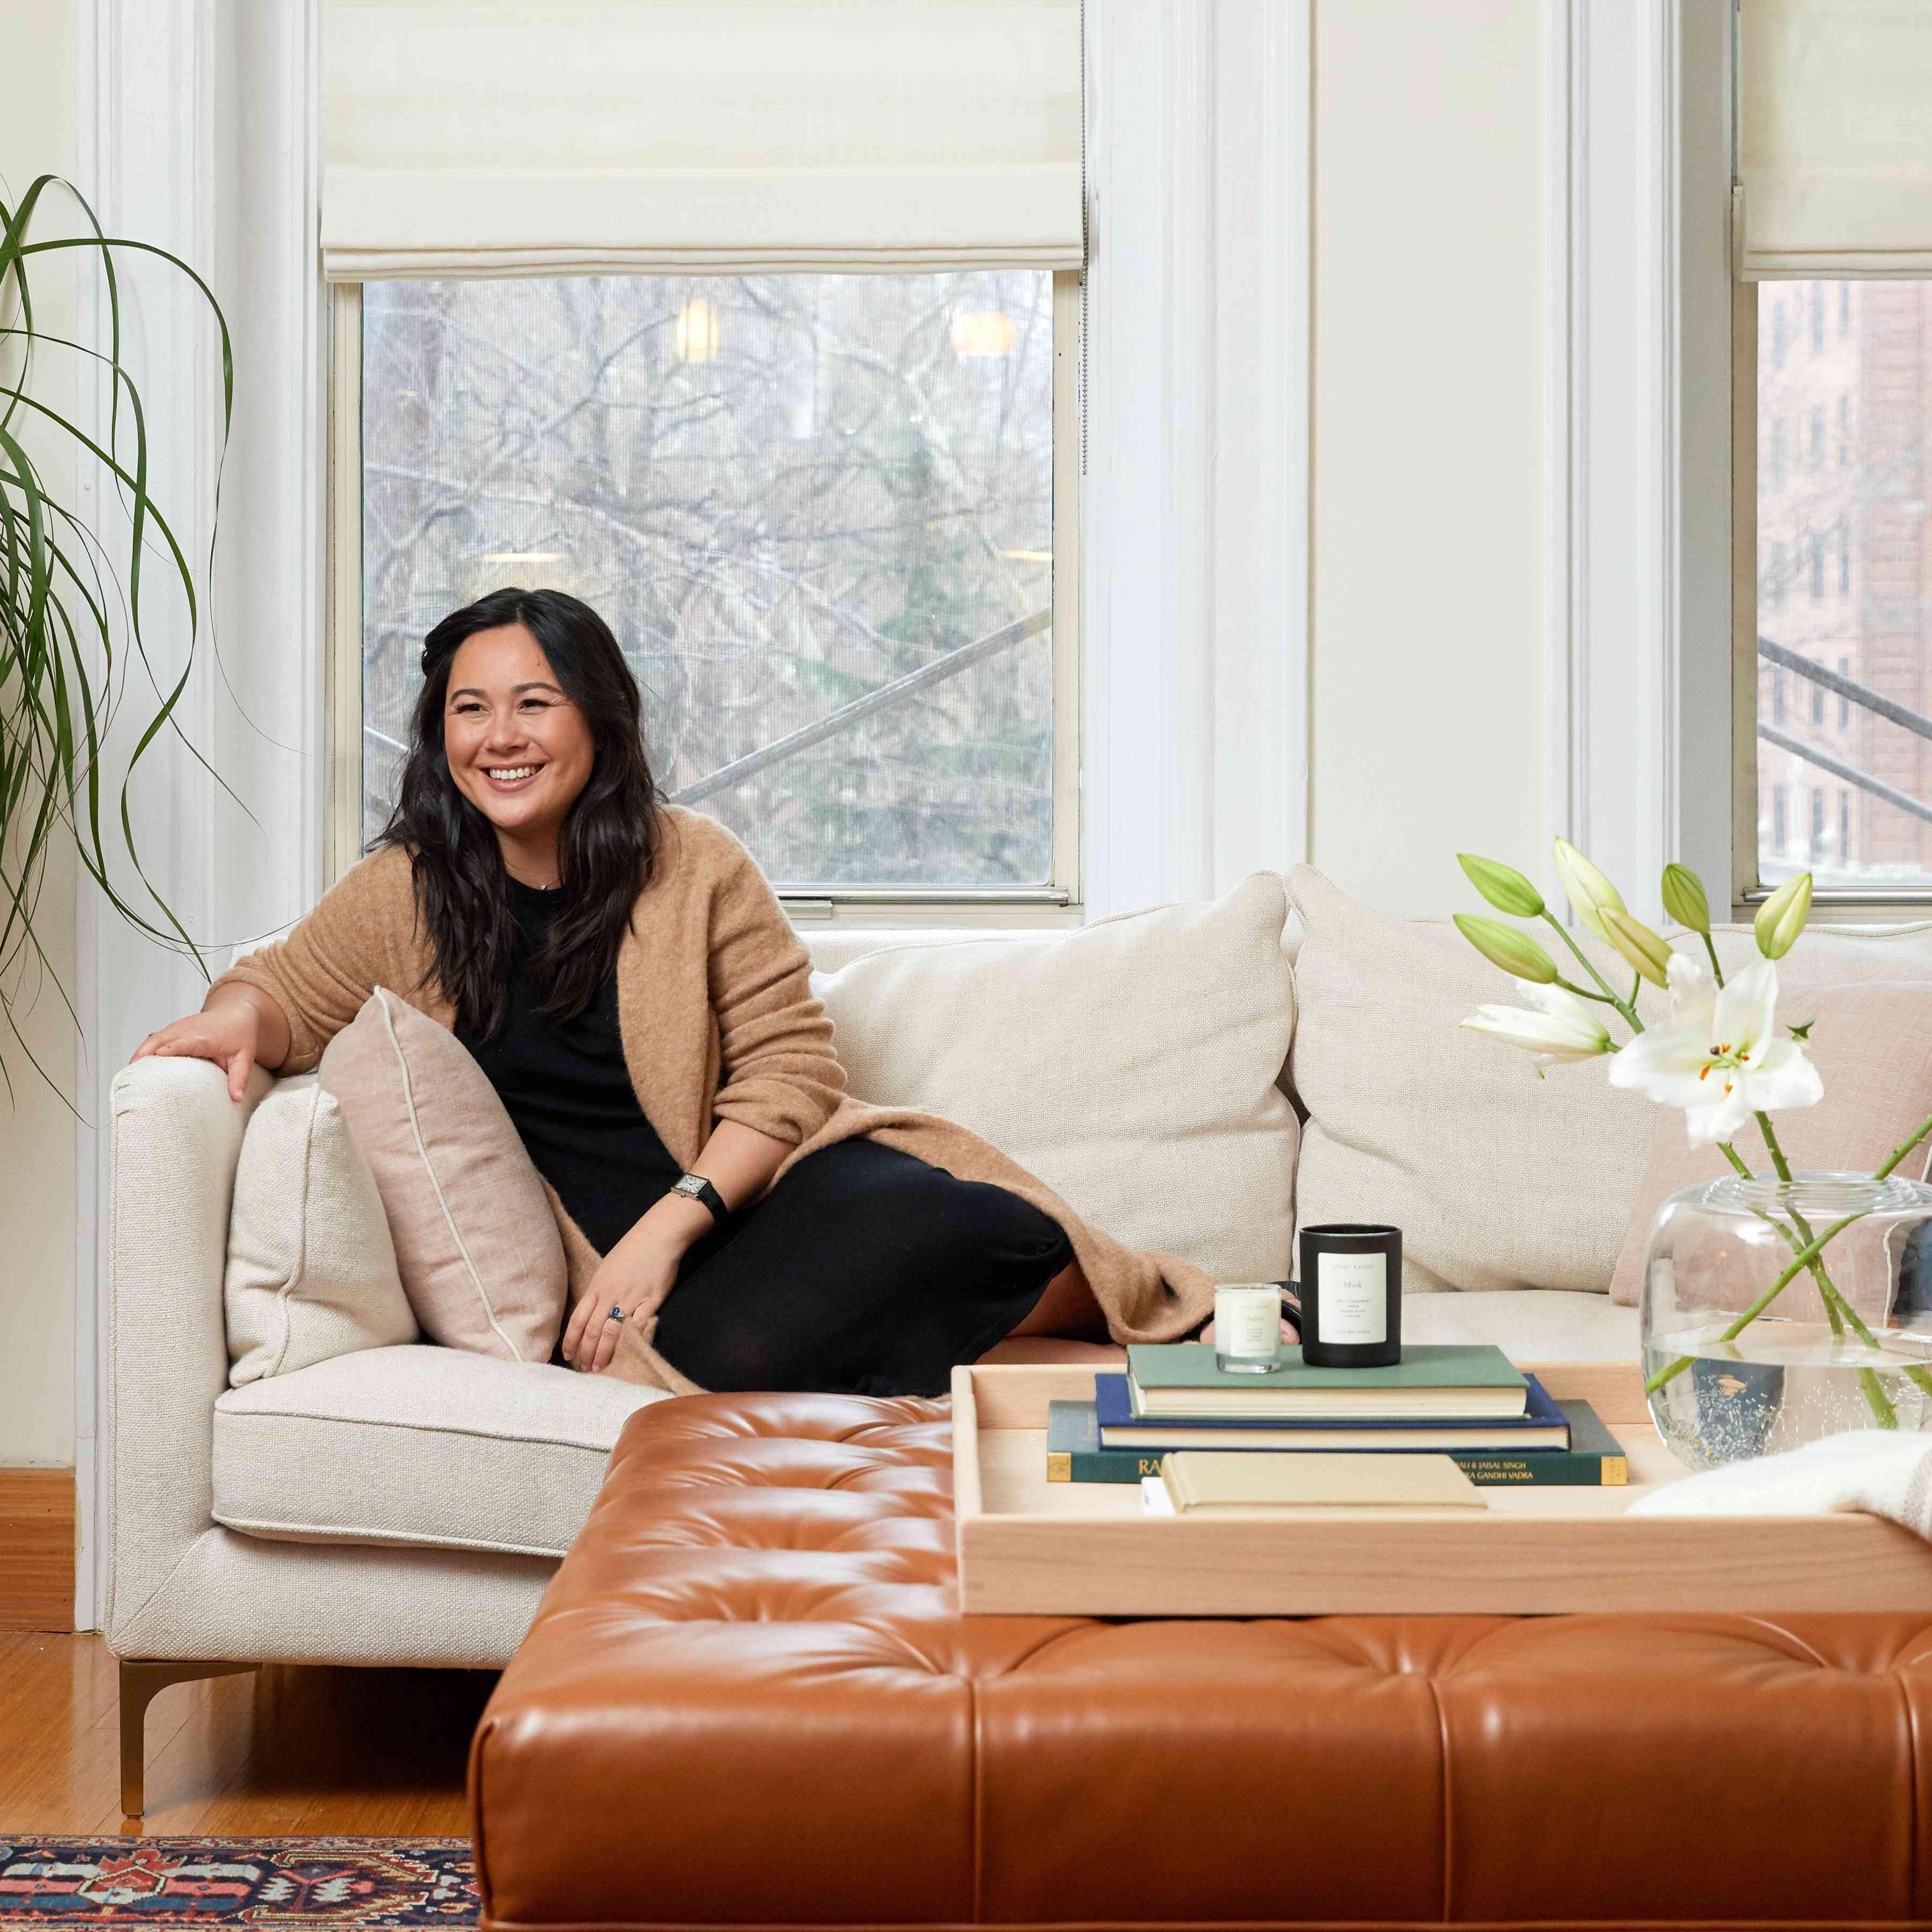 Davina Ogilvie poses on a white couch